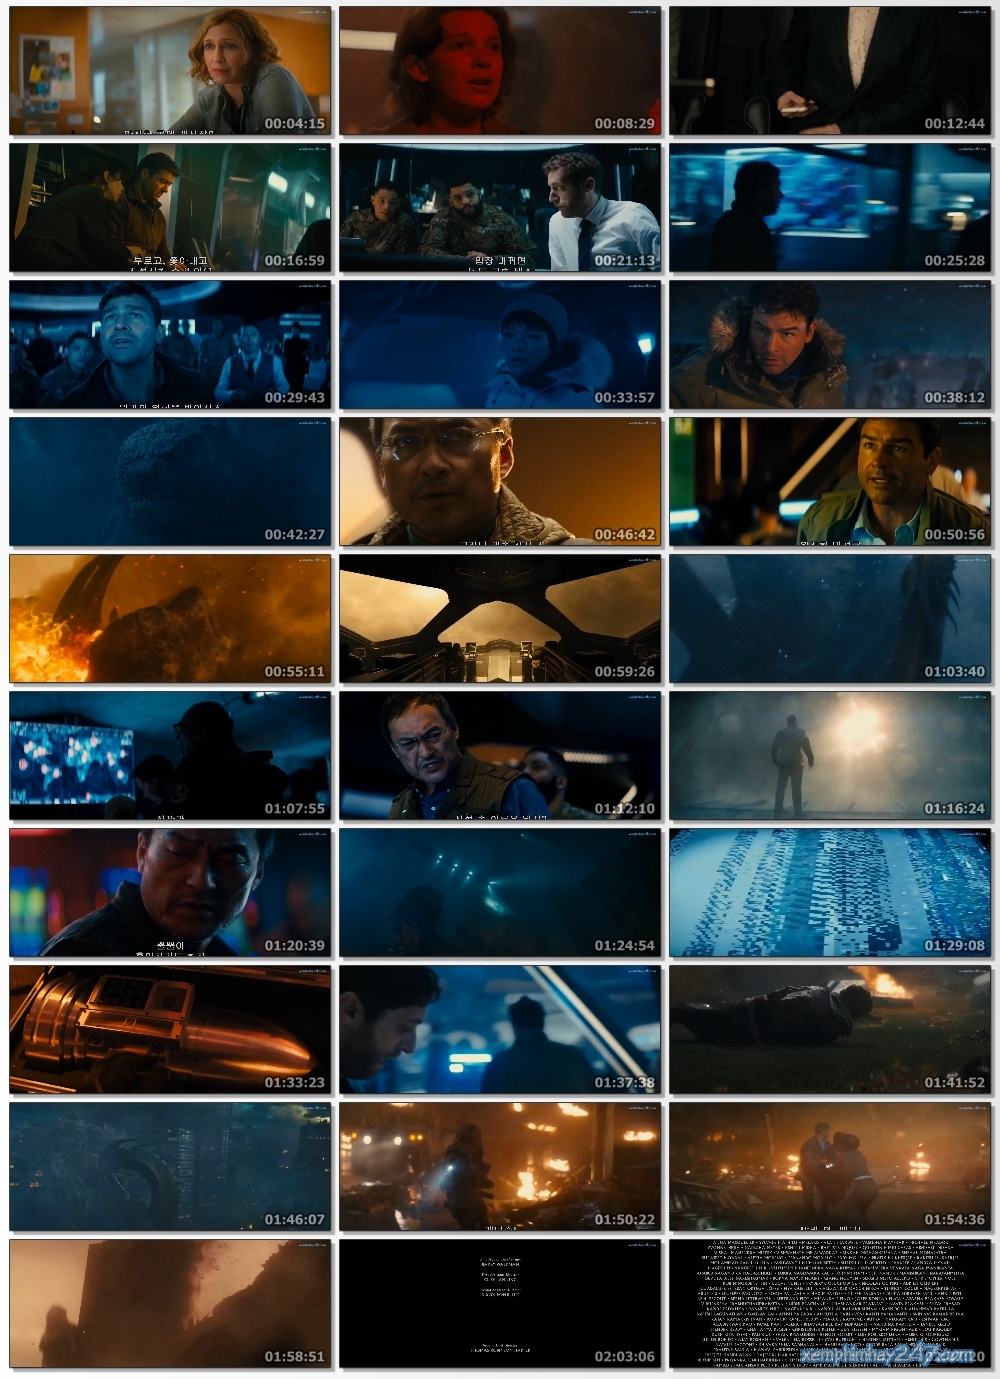 http://xemphimhay247.com - Xem phim hay 247 - Chúa Tể Godzilla (2019) - Godzilla: King Of The Monsters (2019)